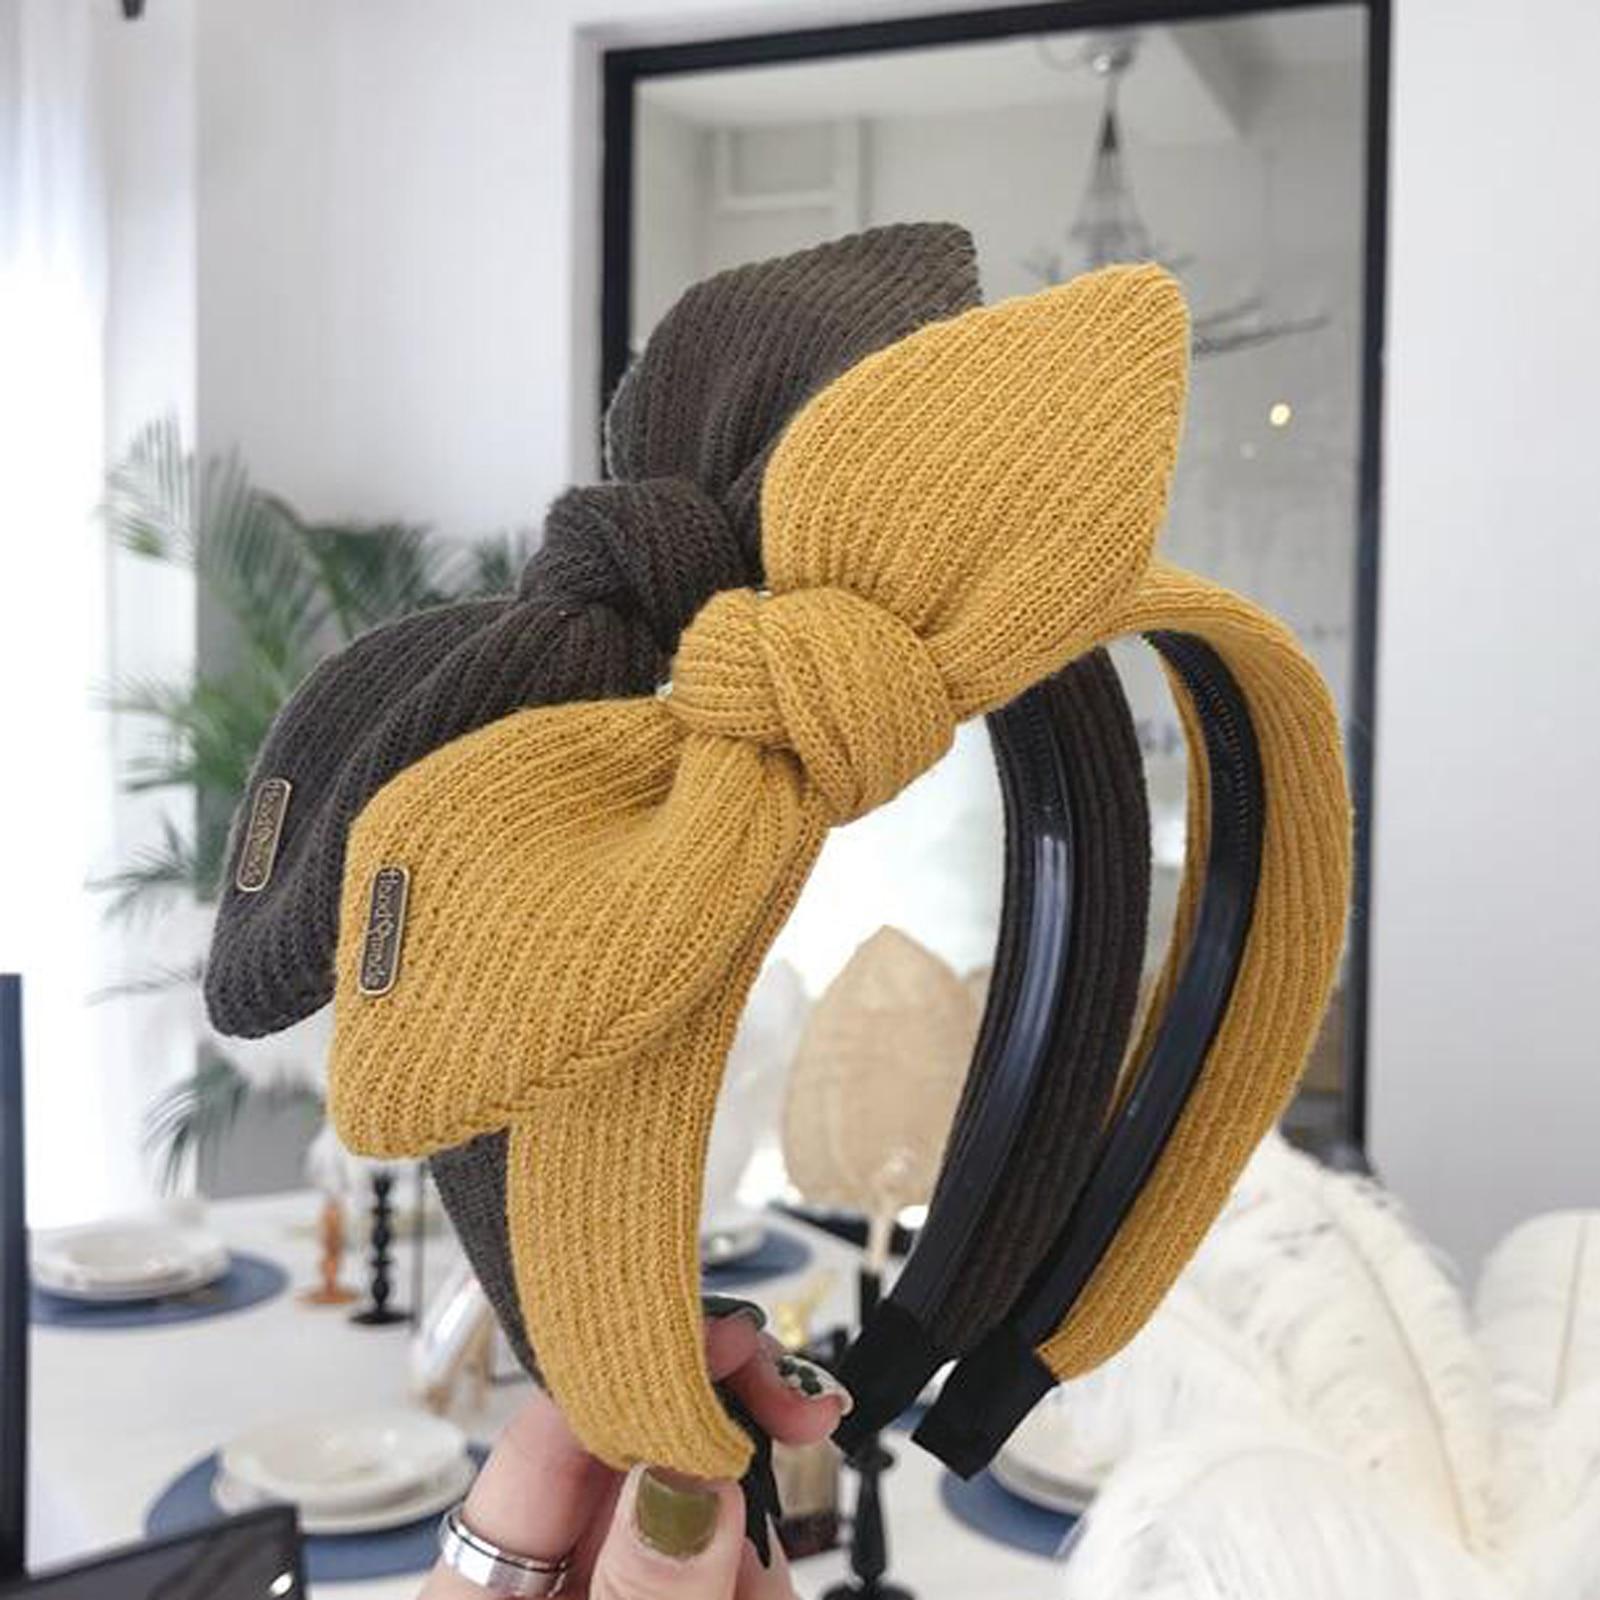 New Fashion Women Hairband Knitted Headband Big Bow Knot Headwear Rhinestone Hair Band Girls Turban Hair Accessories